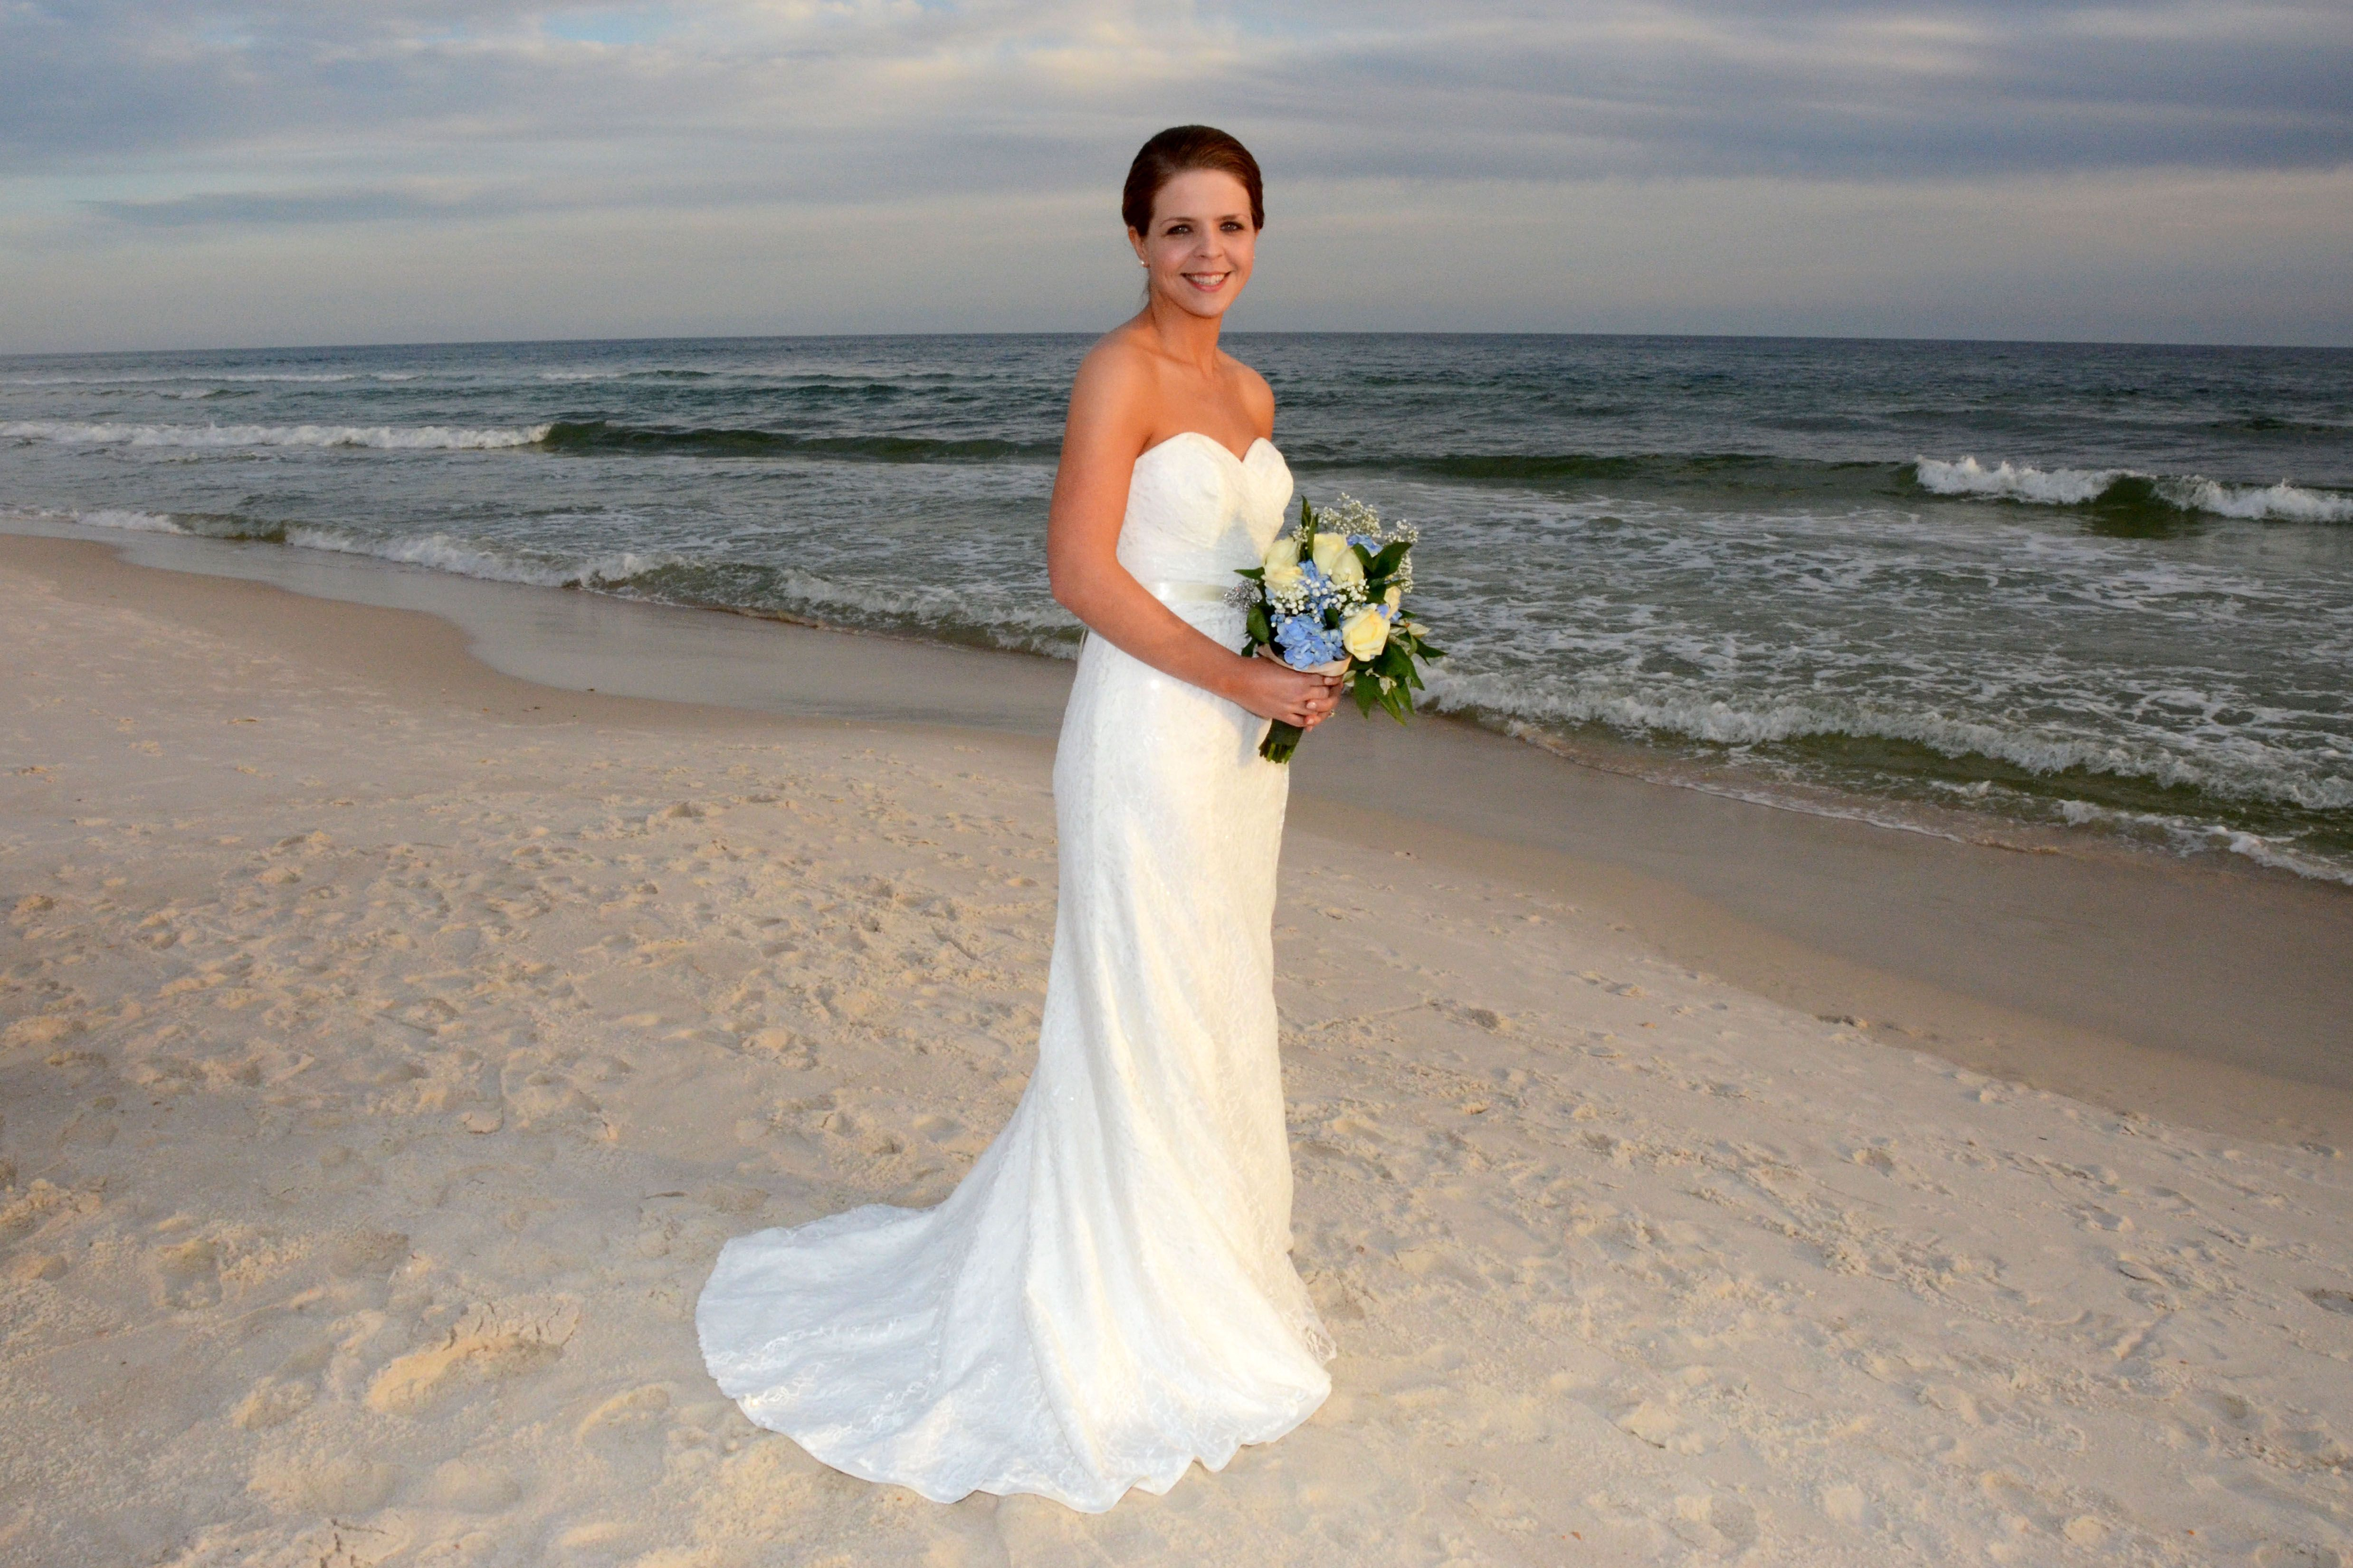 Destination beach wedding on Panama City Beach Florida